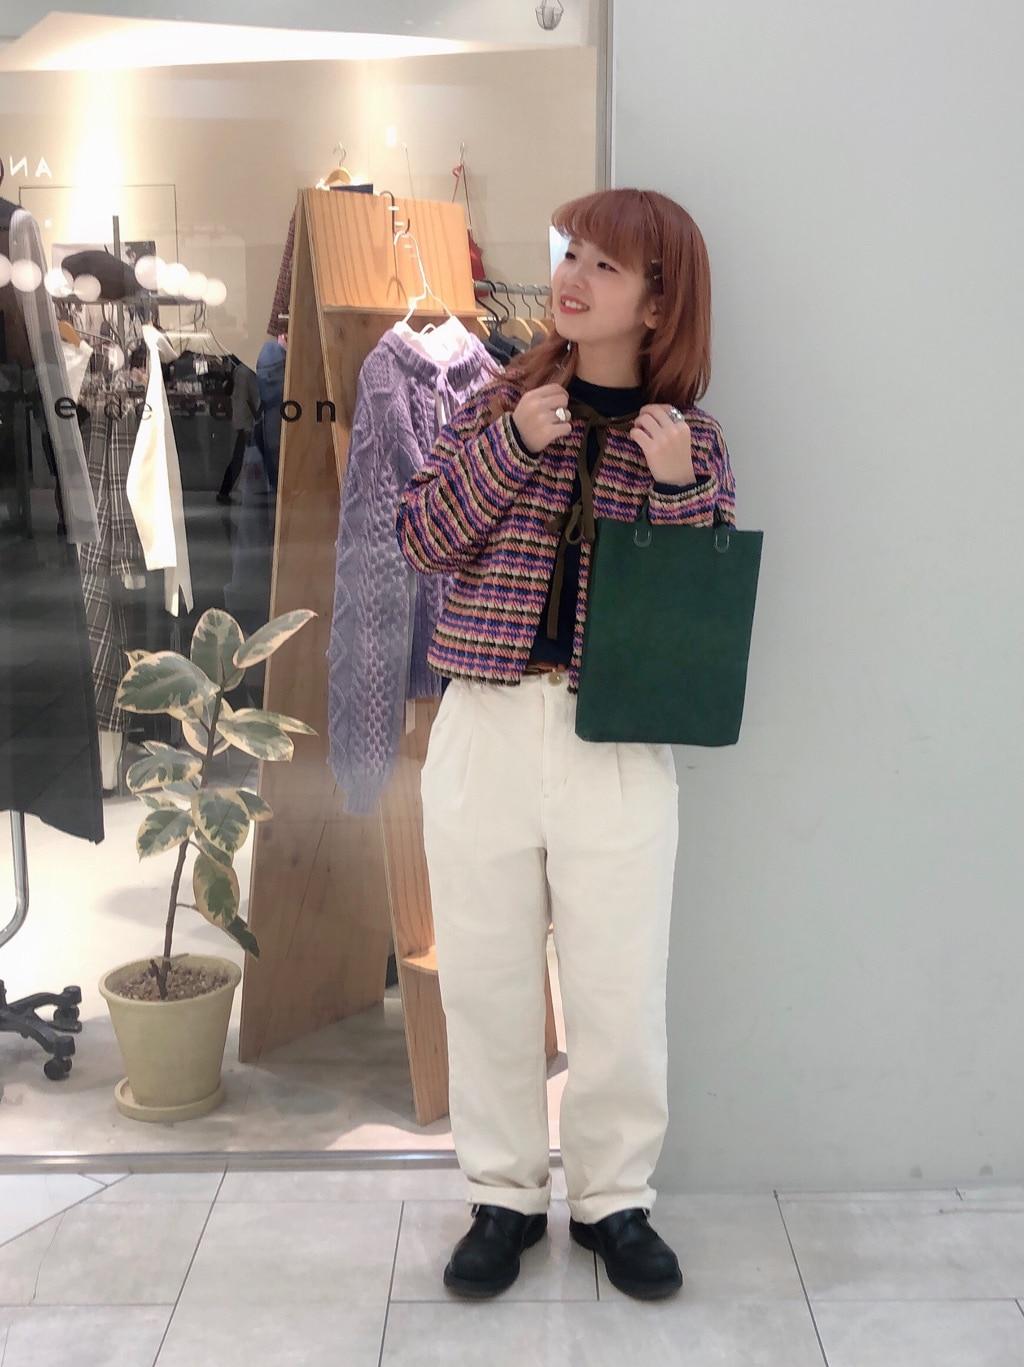 bulle de savon 阪急西宮ガーデンズ 身長:152cm 2019.11.25